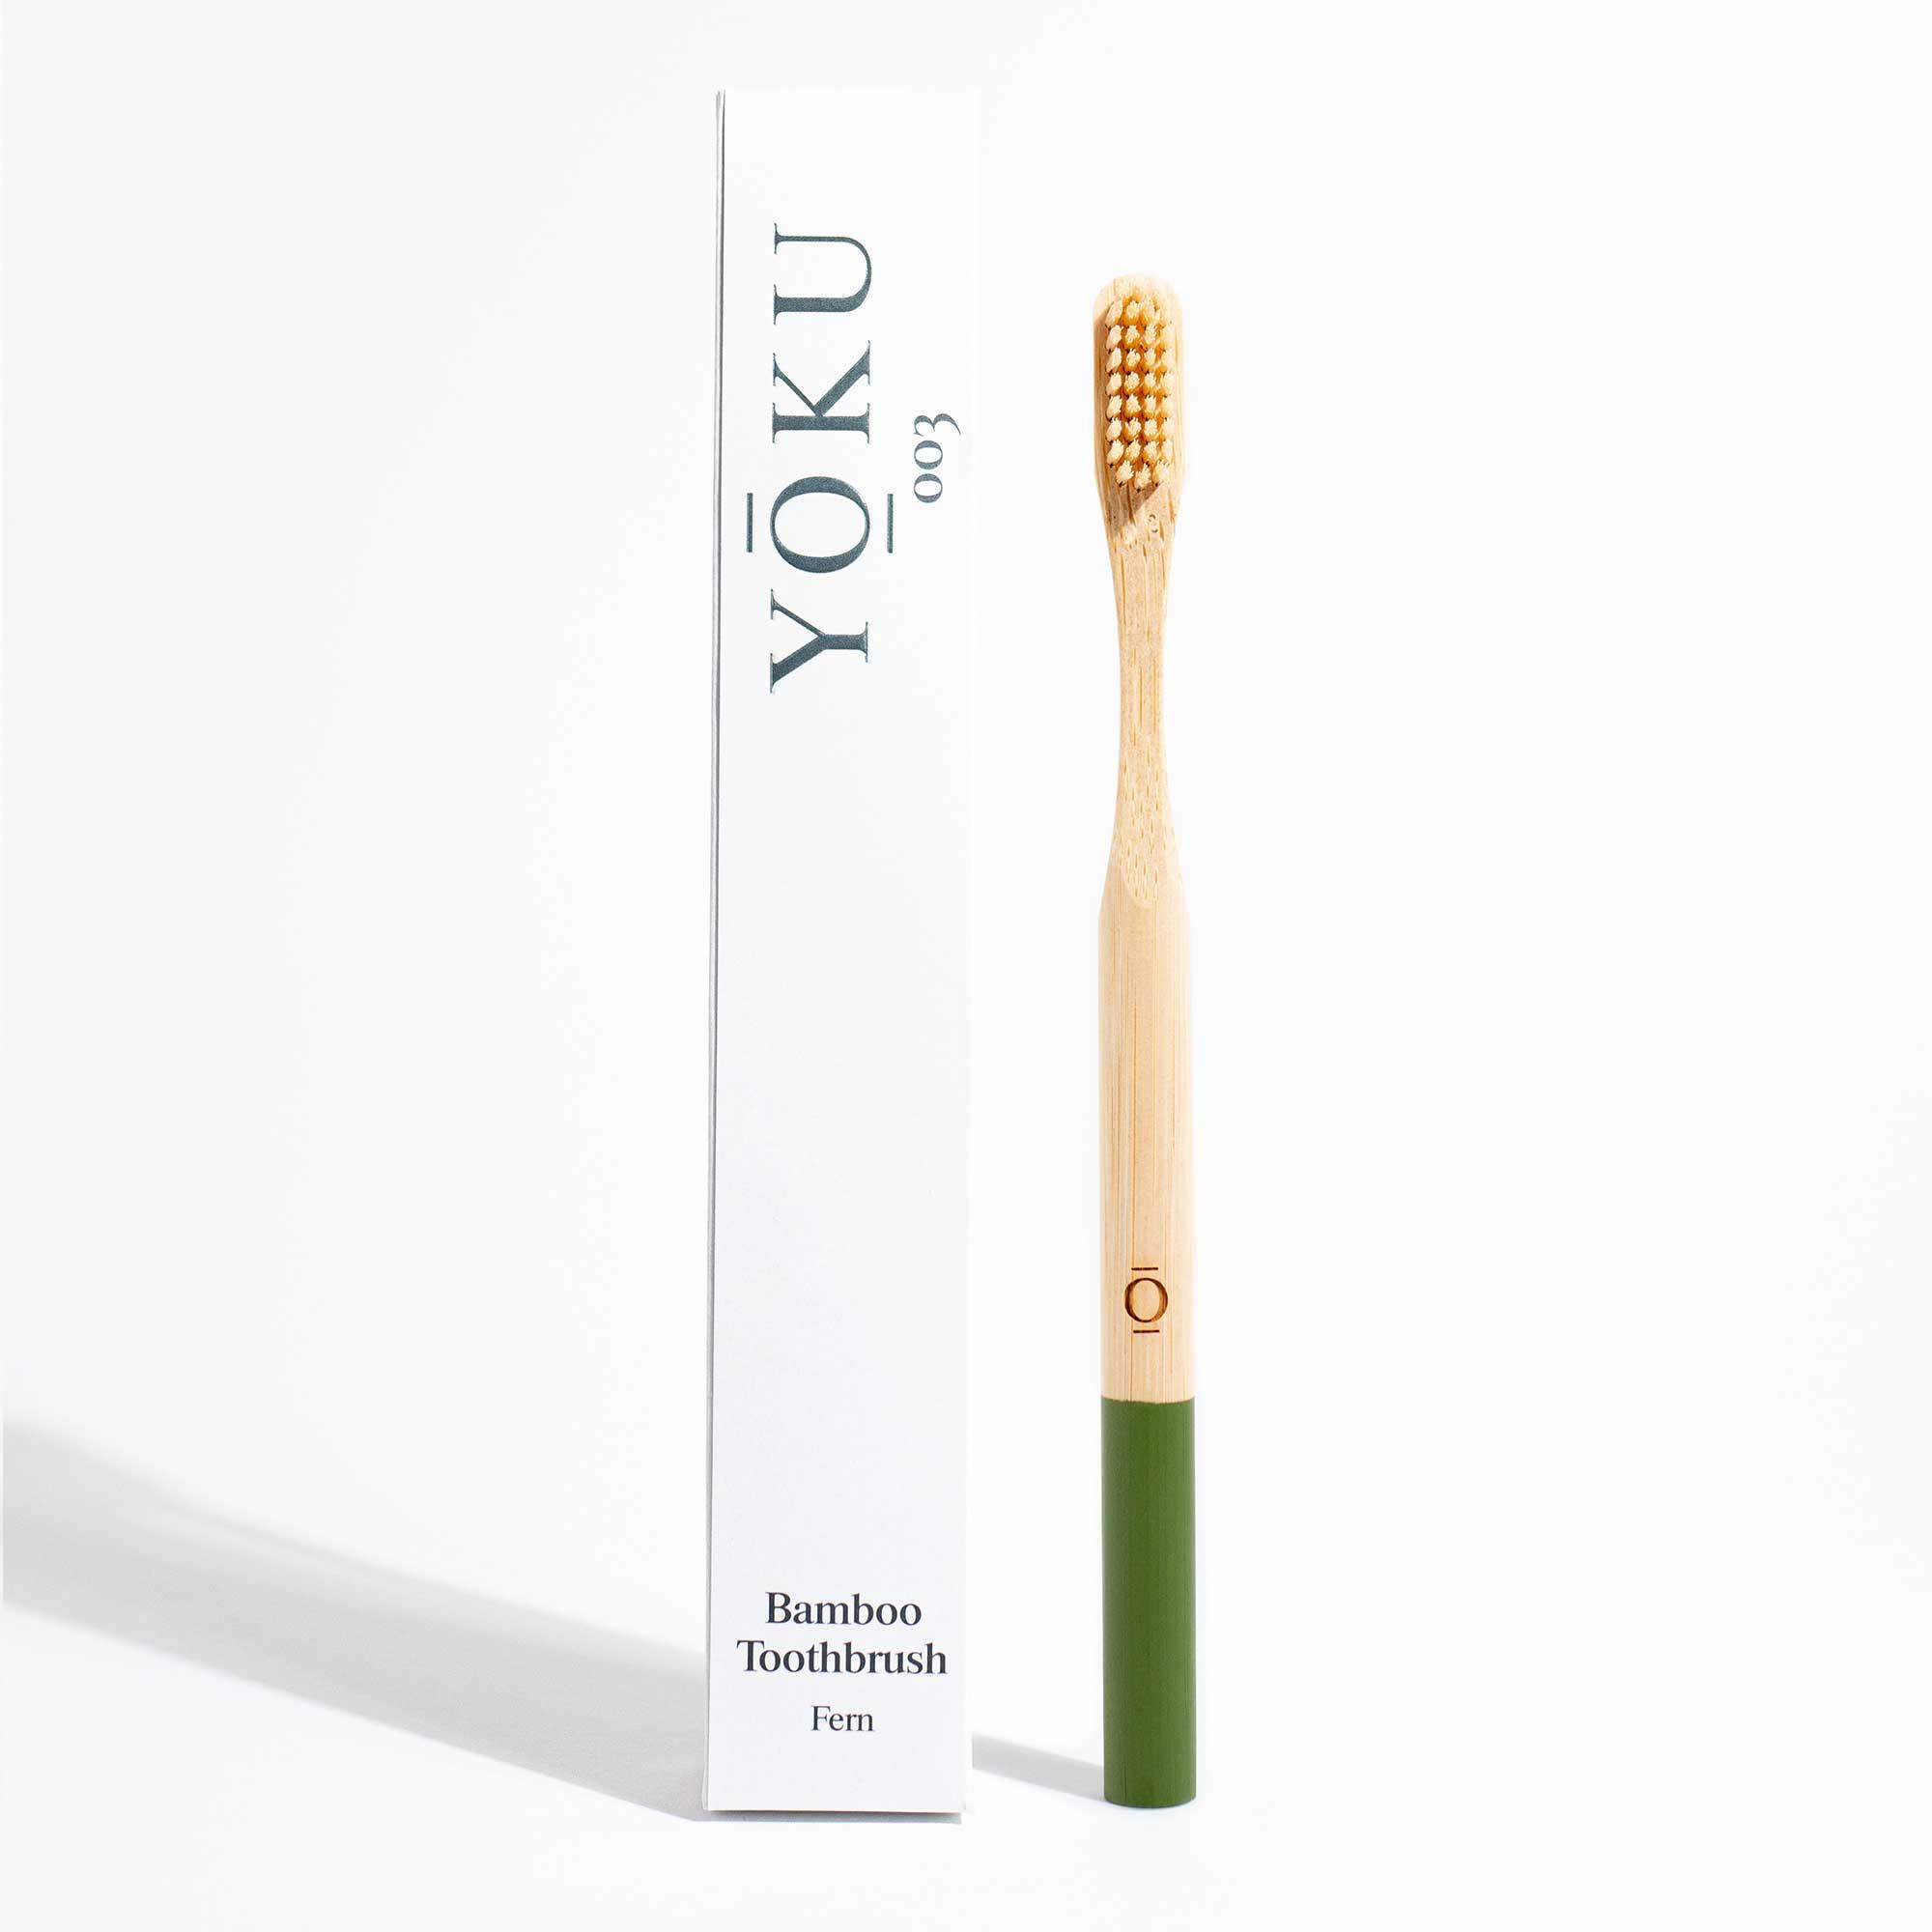 Grace and Green - YOKU Bamboo Toothbrush - Fern 1